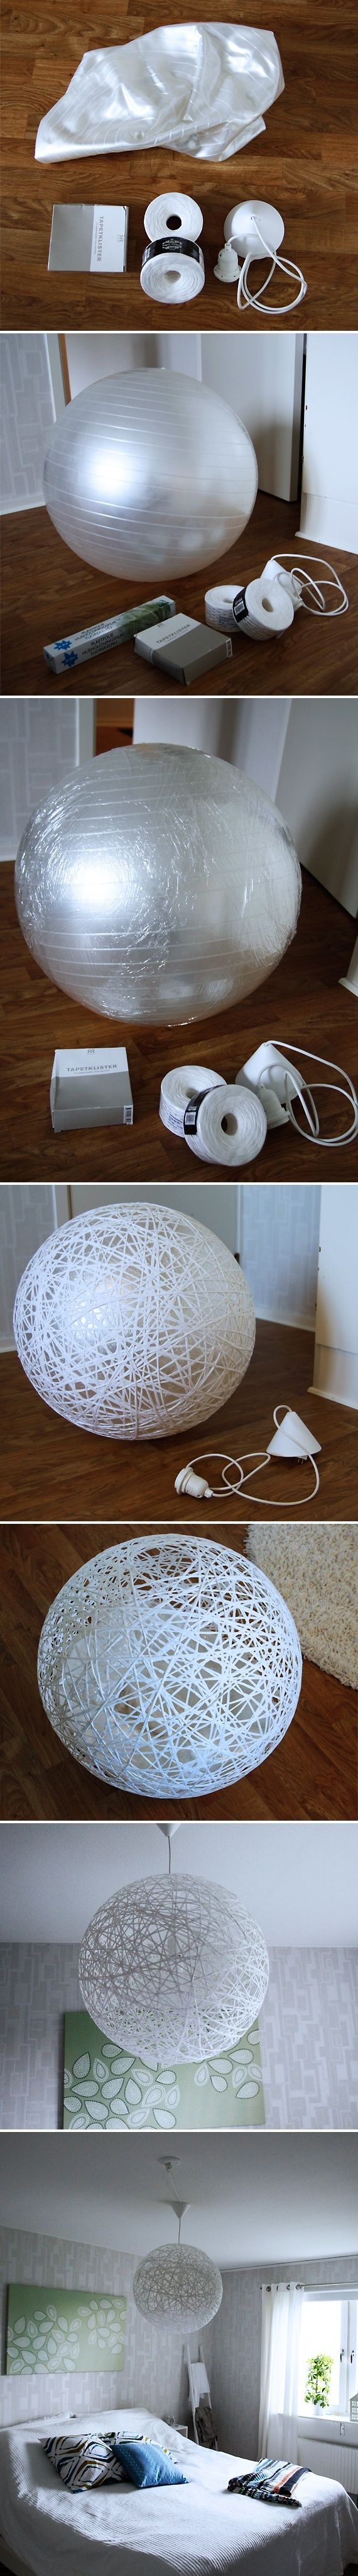 Top 10 Fun Craft Ideas